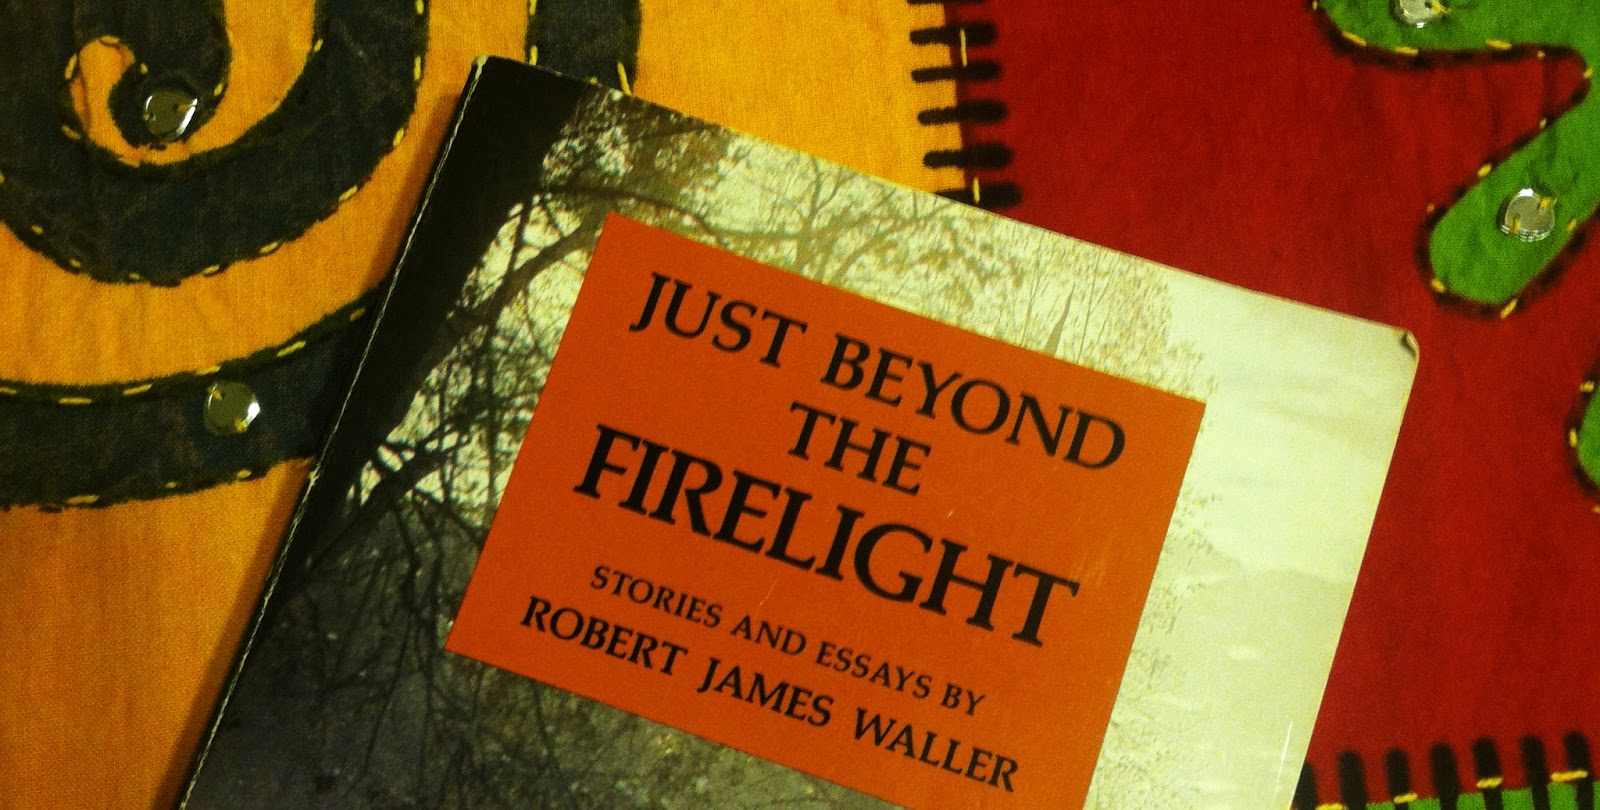 beyond essay firelight just story